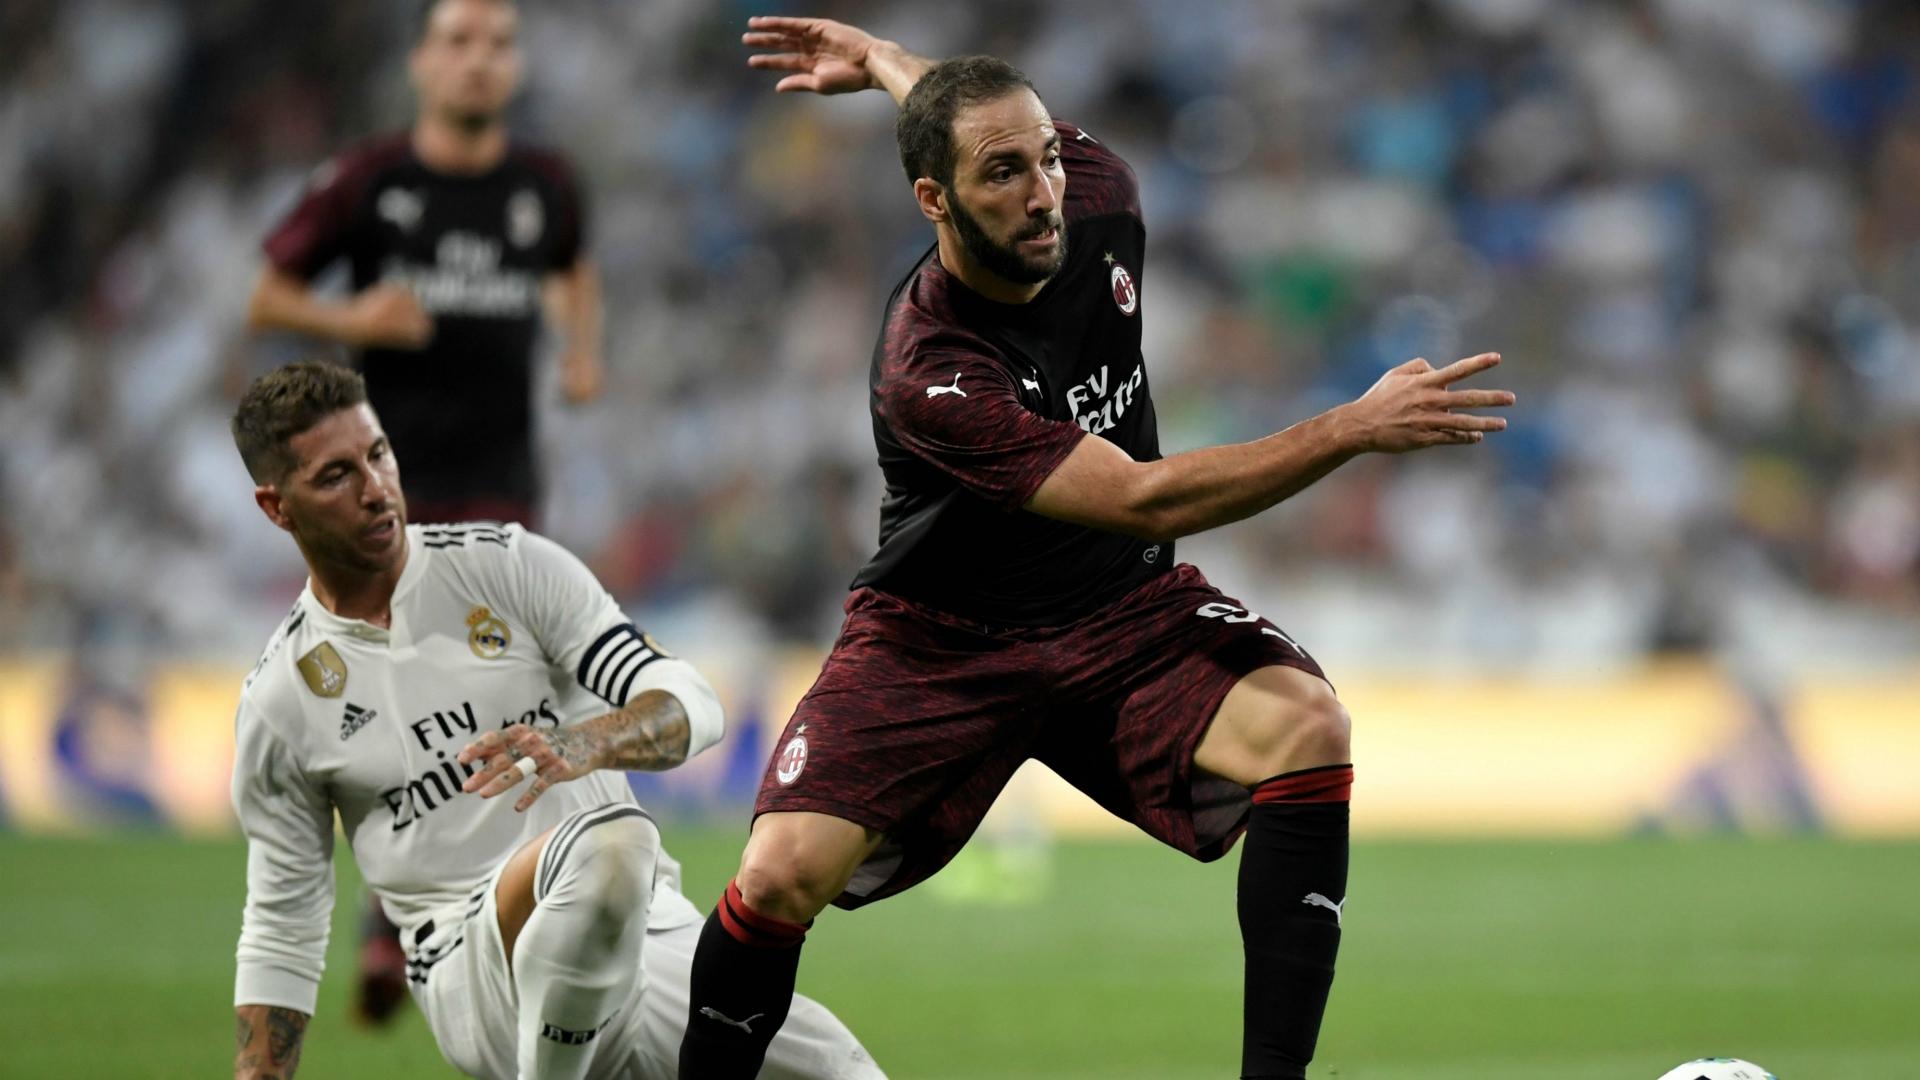 Sergio Ramos Gonzalo Higuain Real Madrid Milan Friendlies 08112018